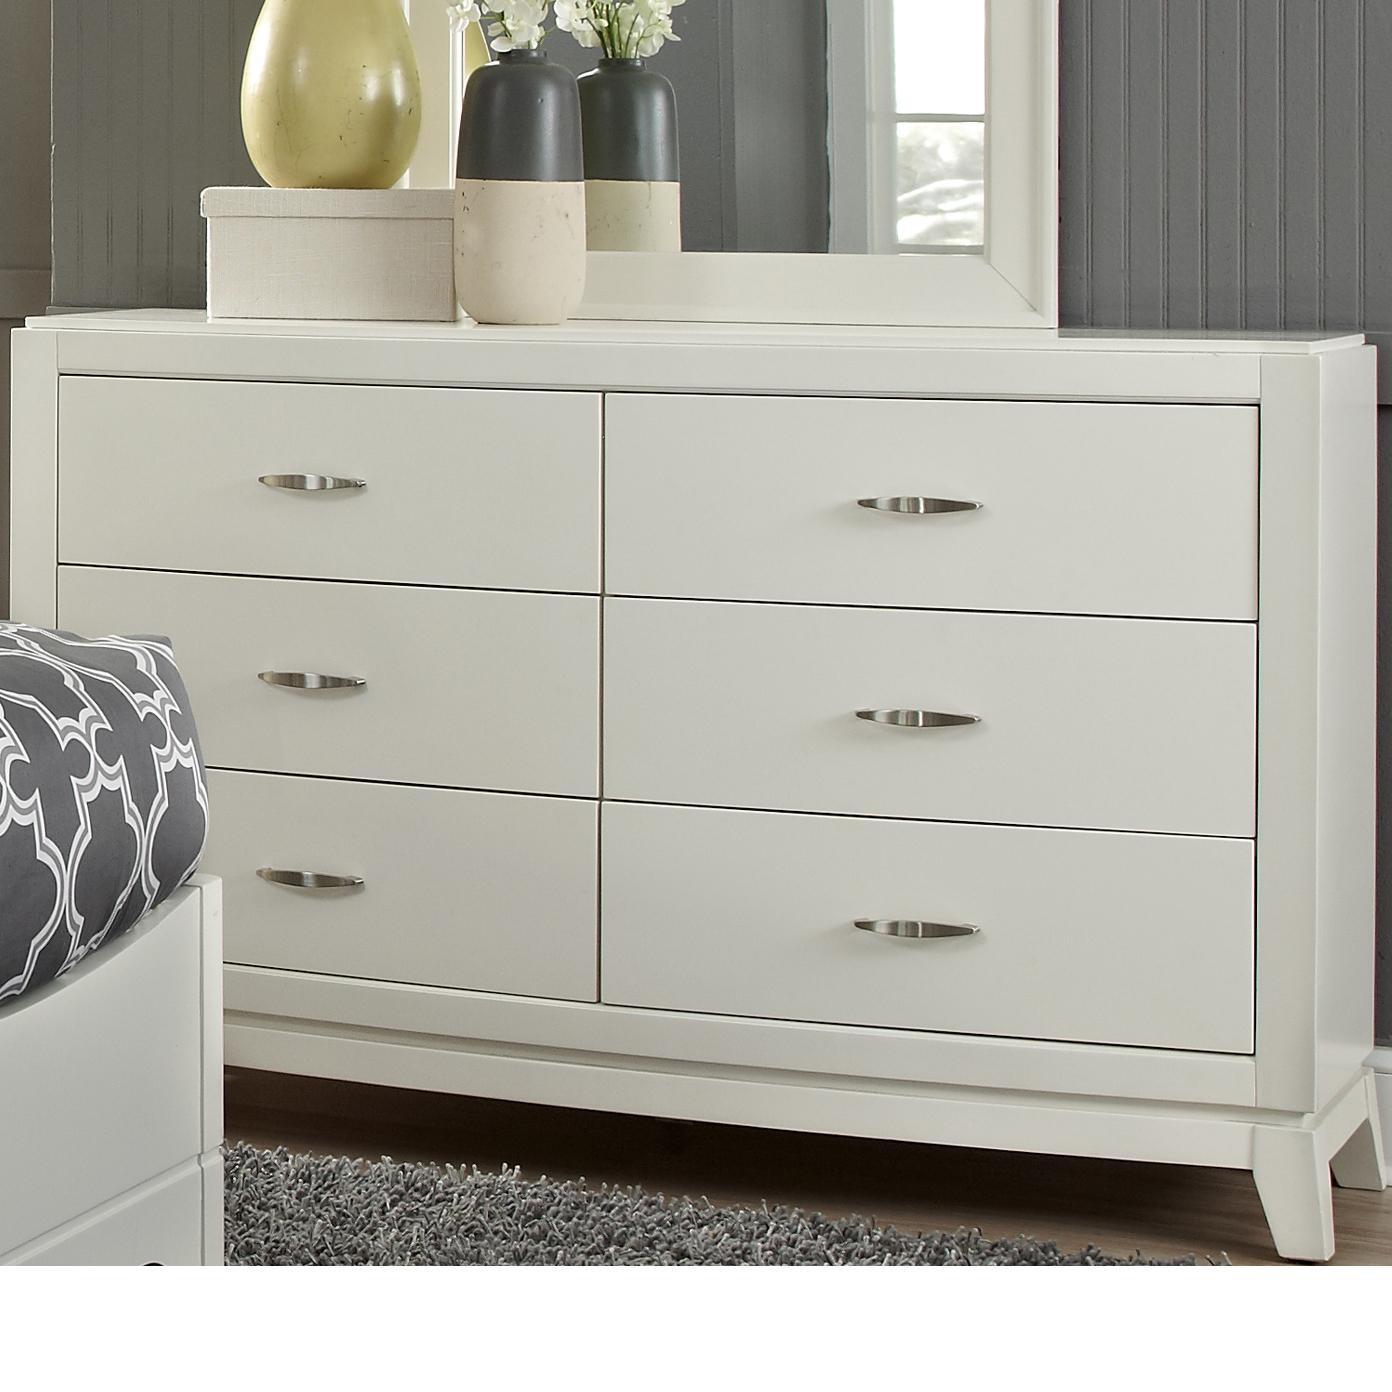 Liberty Furniture Avalon II Dresser - Item Number: 205-BR30